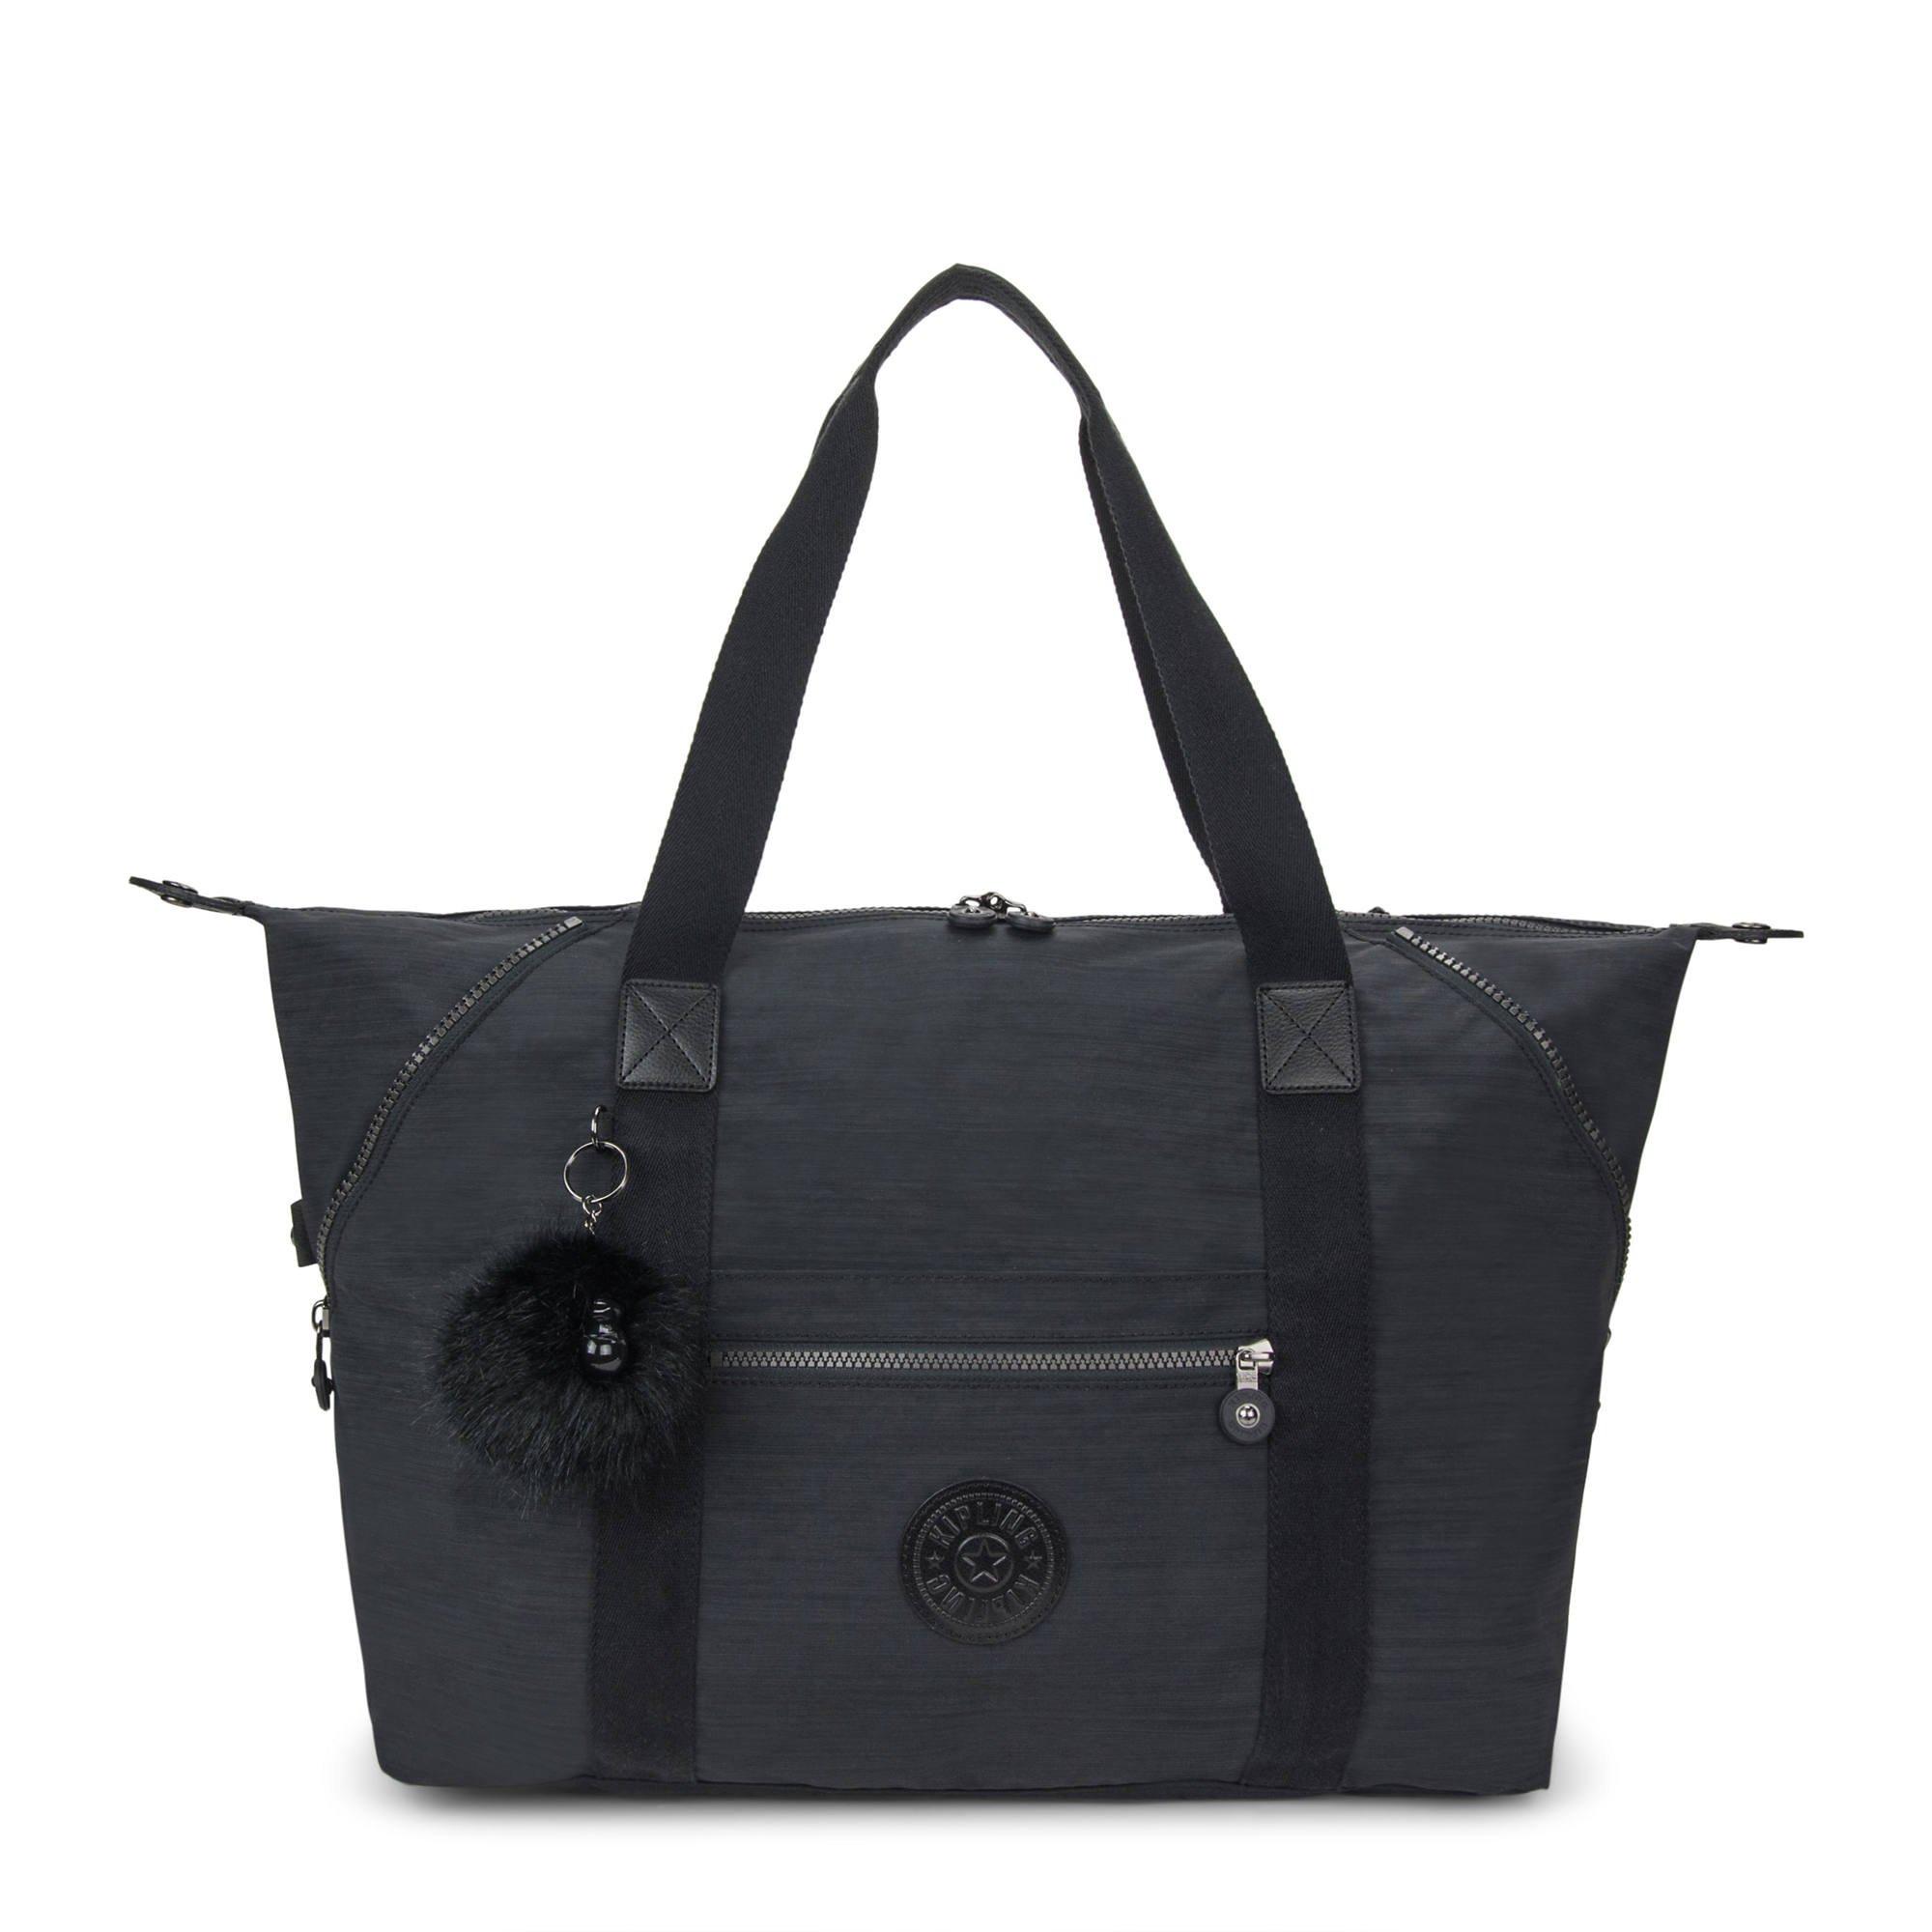 Kipling Women's Art Medium Tote Bag One Size True Dazz Black